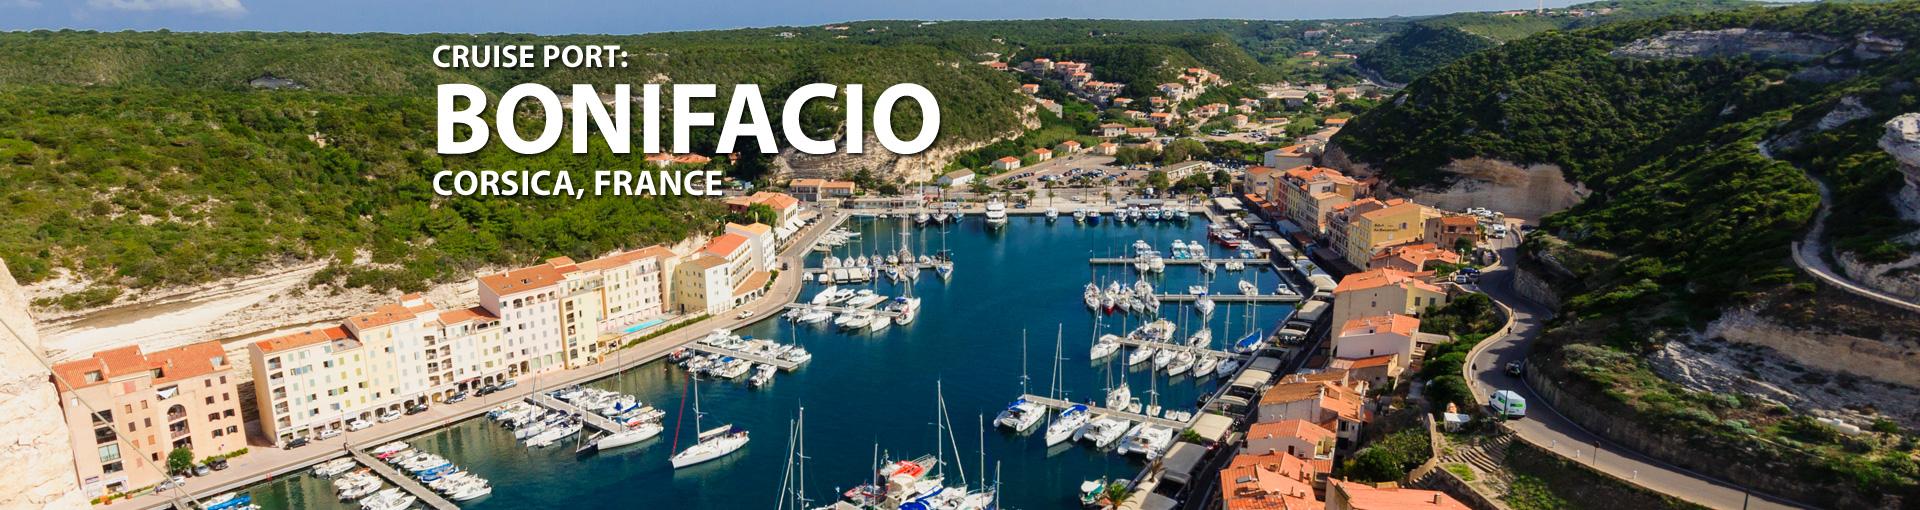 Cruises to Bonifacio, Corsica, France